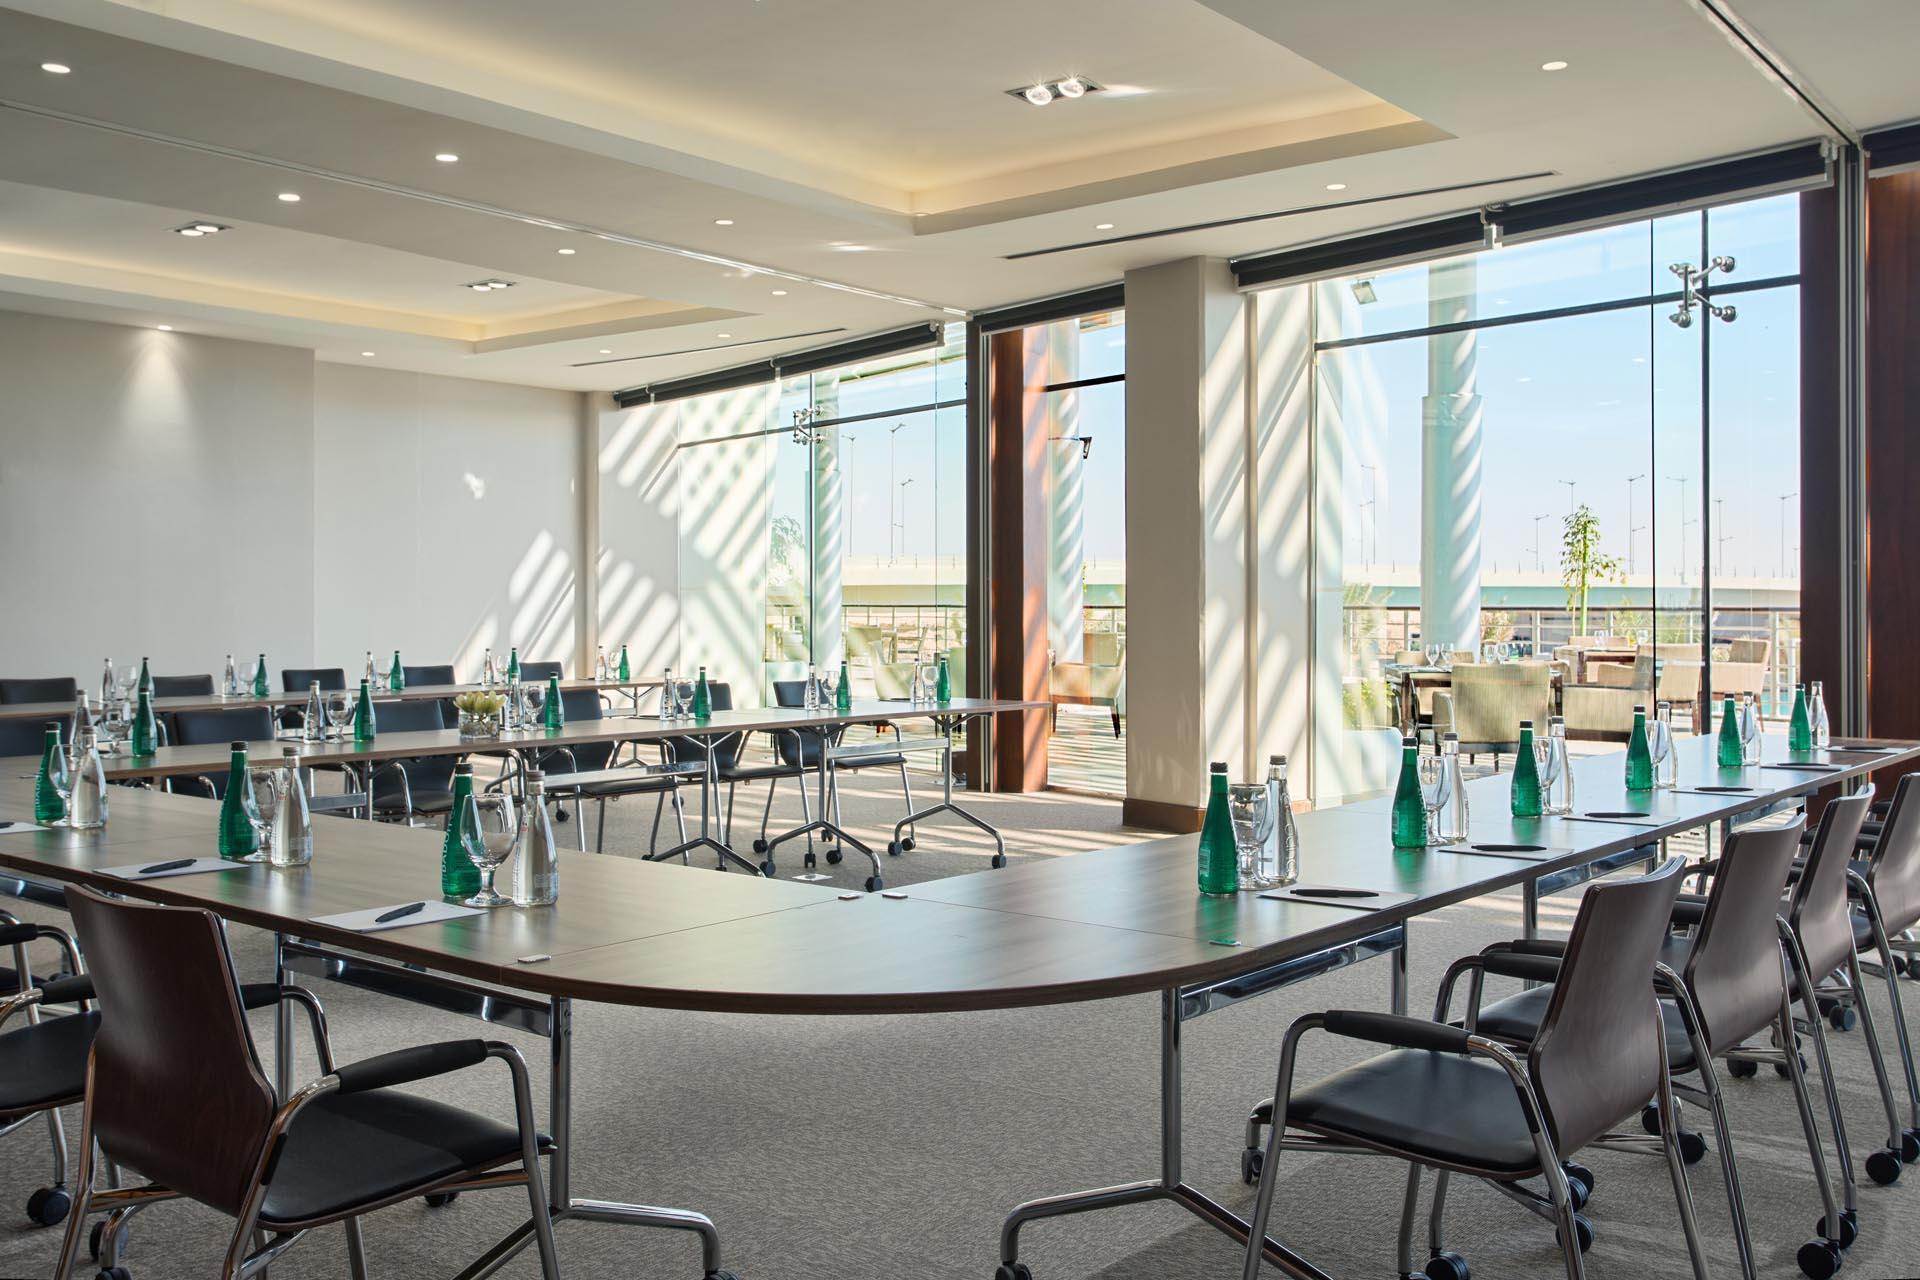 Arranged Marina Meeting Room at Bay La Sun Hotel & Marina